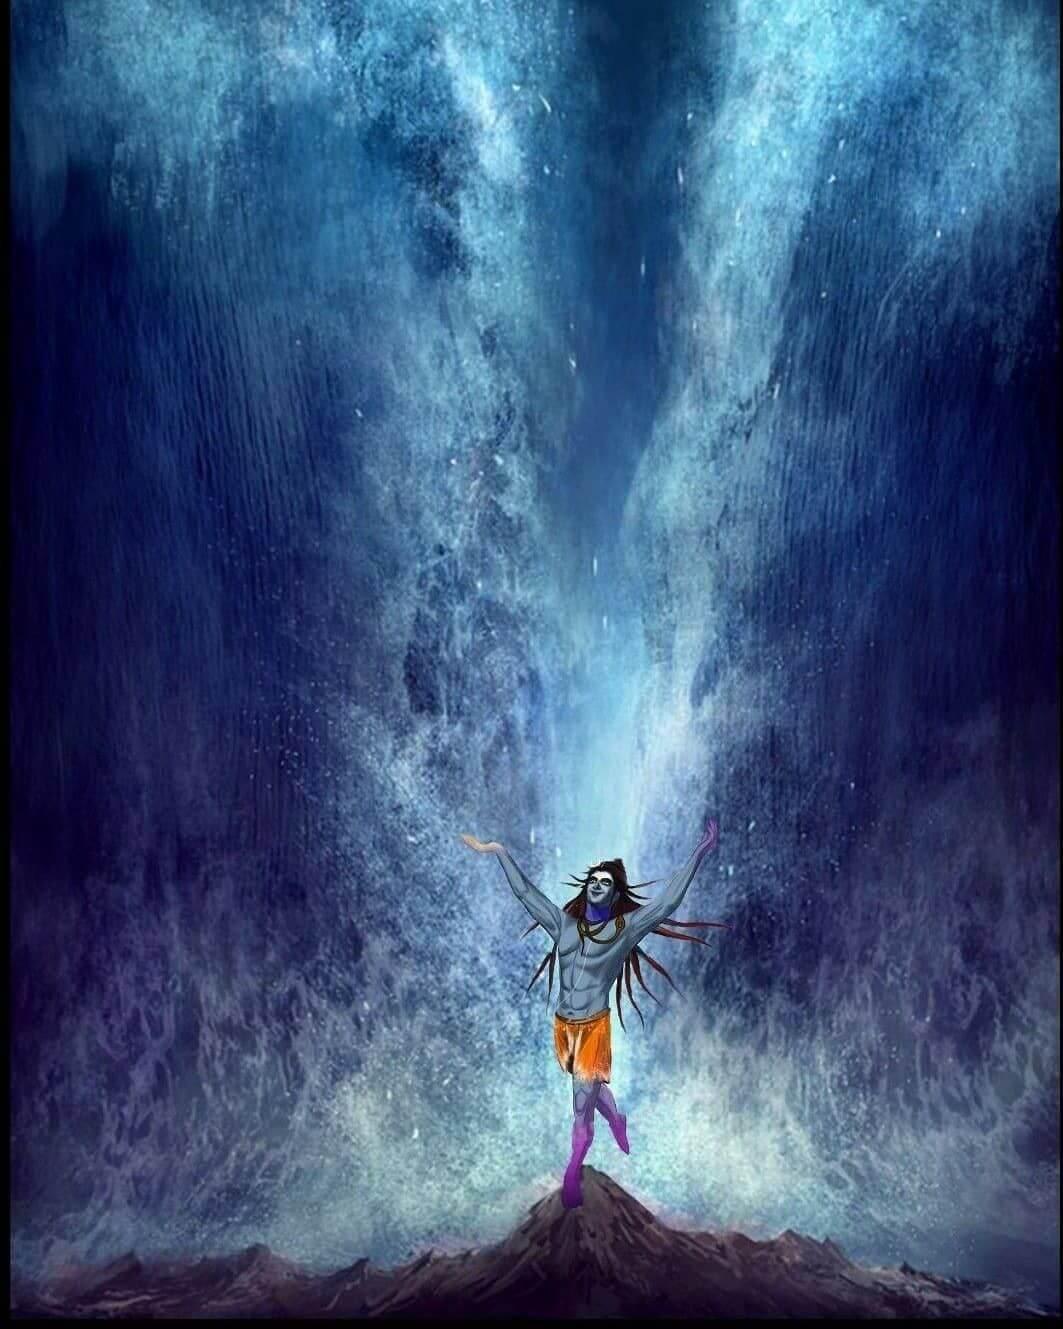 Navina Megha Mandali Niruddhadurdharasphurat रावण रचित शिव तांडव स्तोत्र बोल और अर्थ Shiv Tandav Lyrics And Meaning Made By Ravan (10)